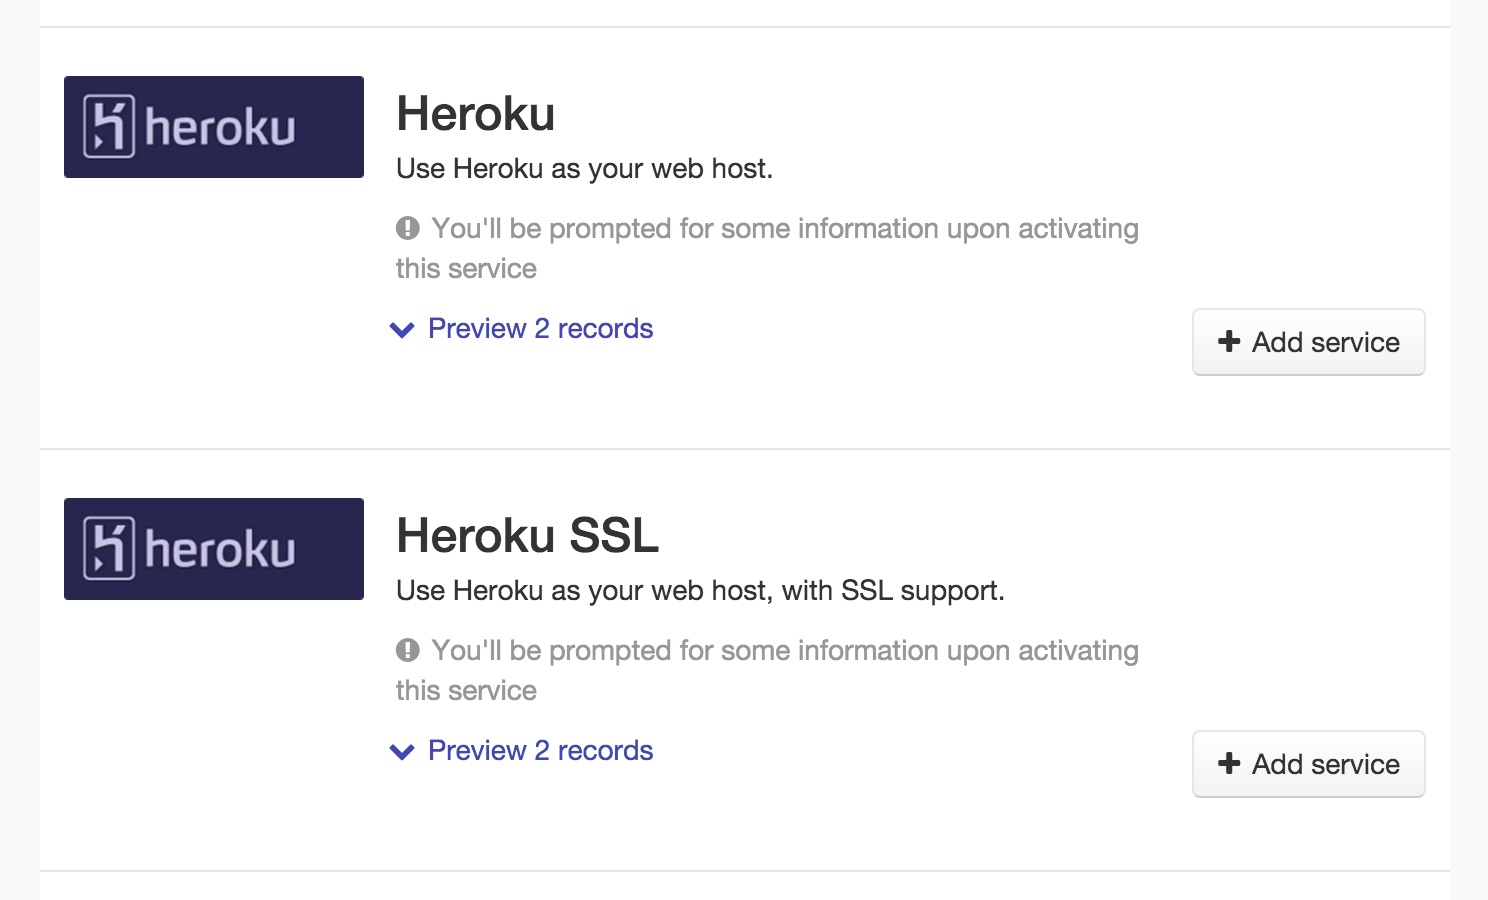 Heroku services